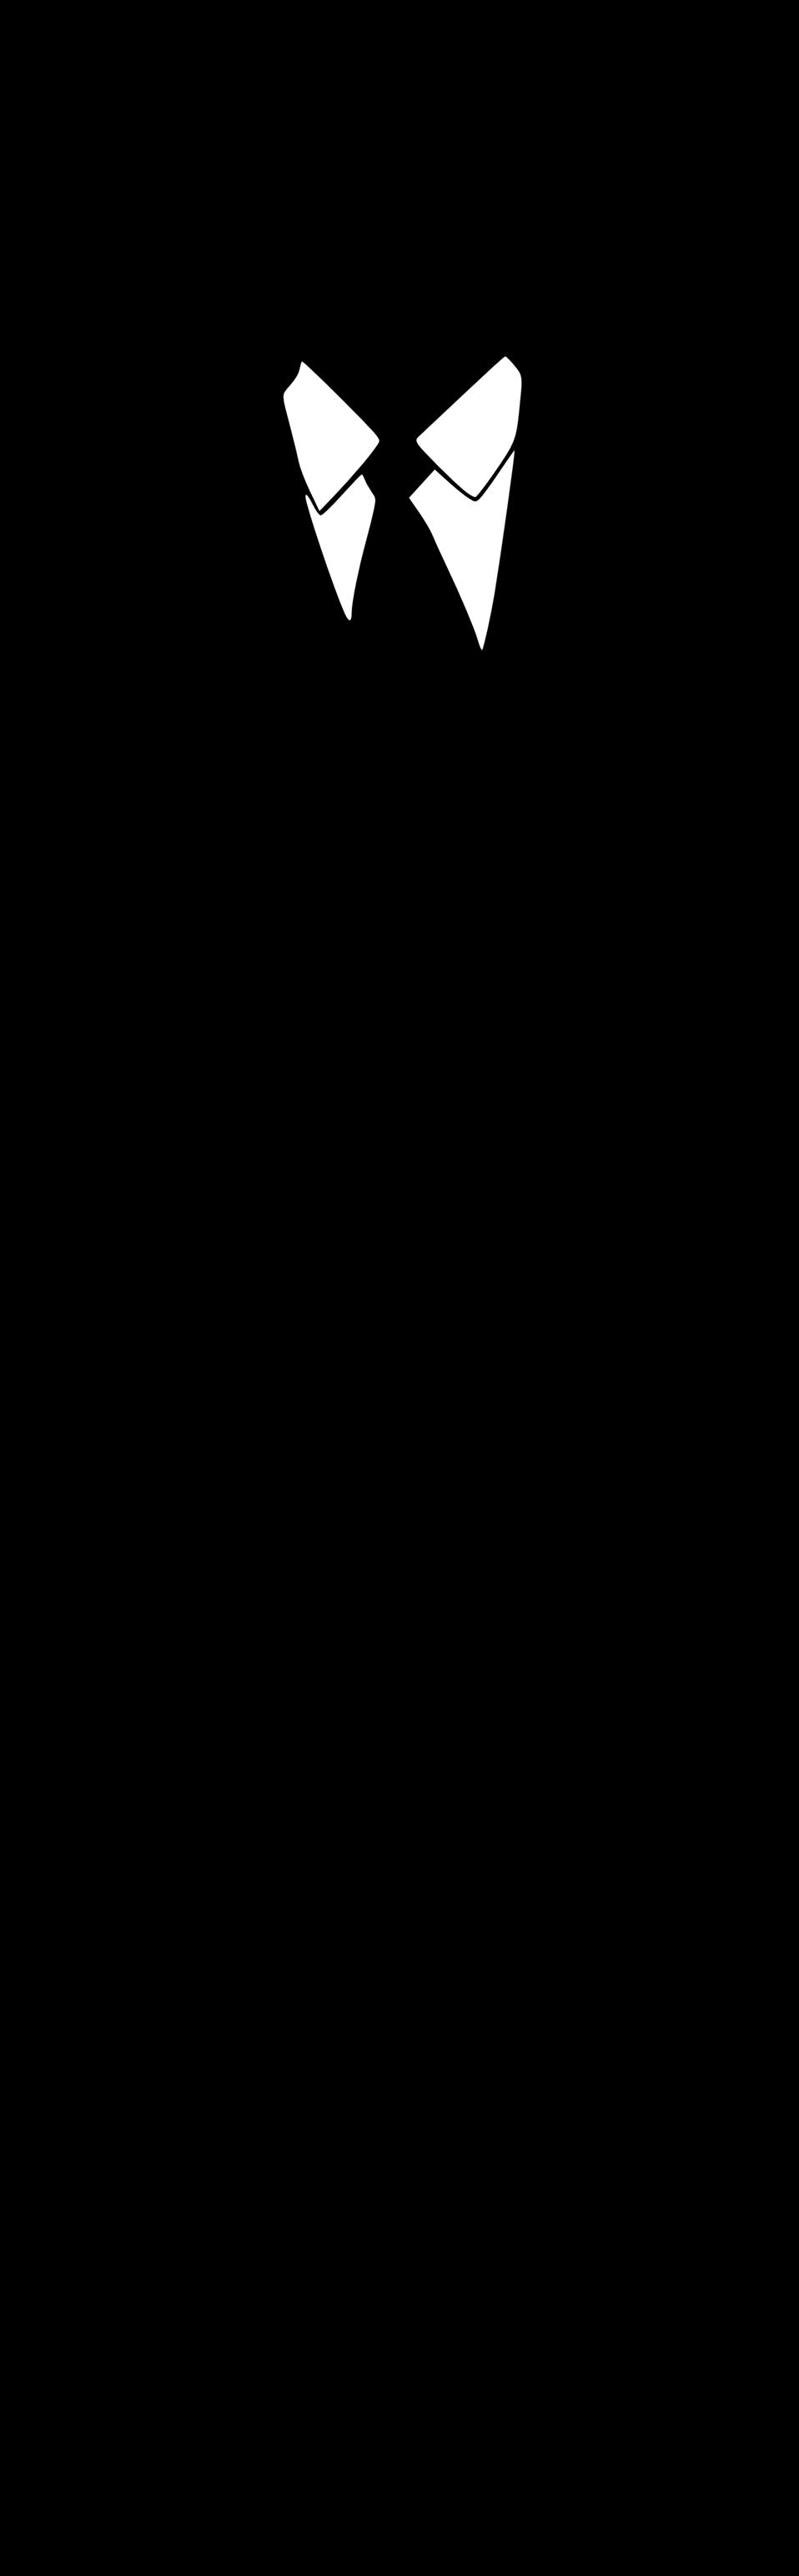 Suit Clipartpublic Domain Clip Art Image Silhouette Of A Man In A Suit